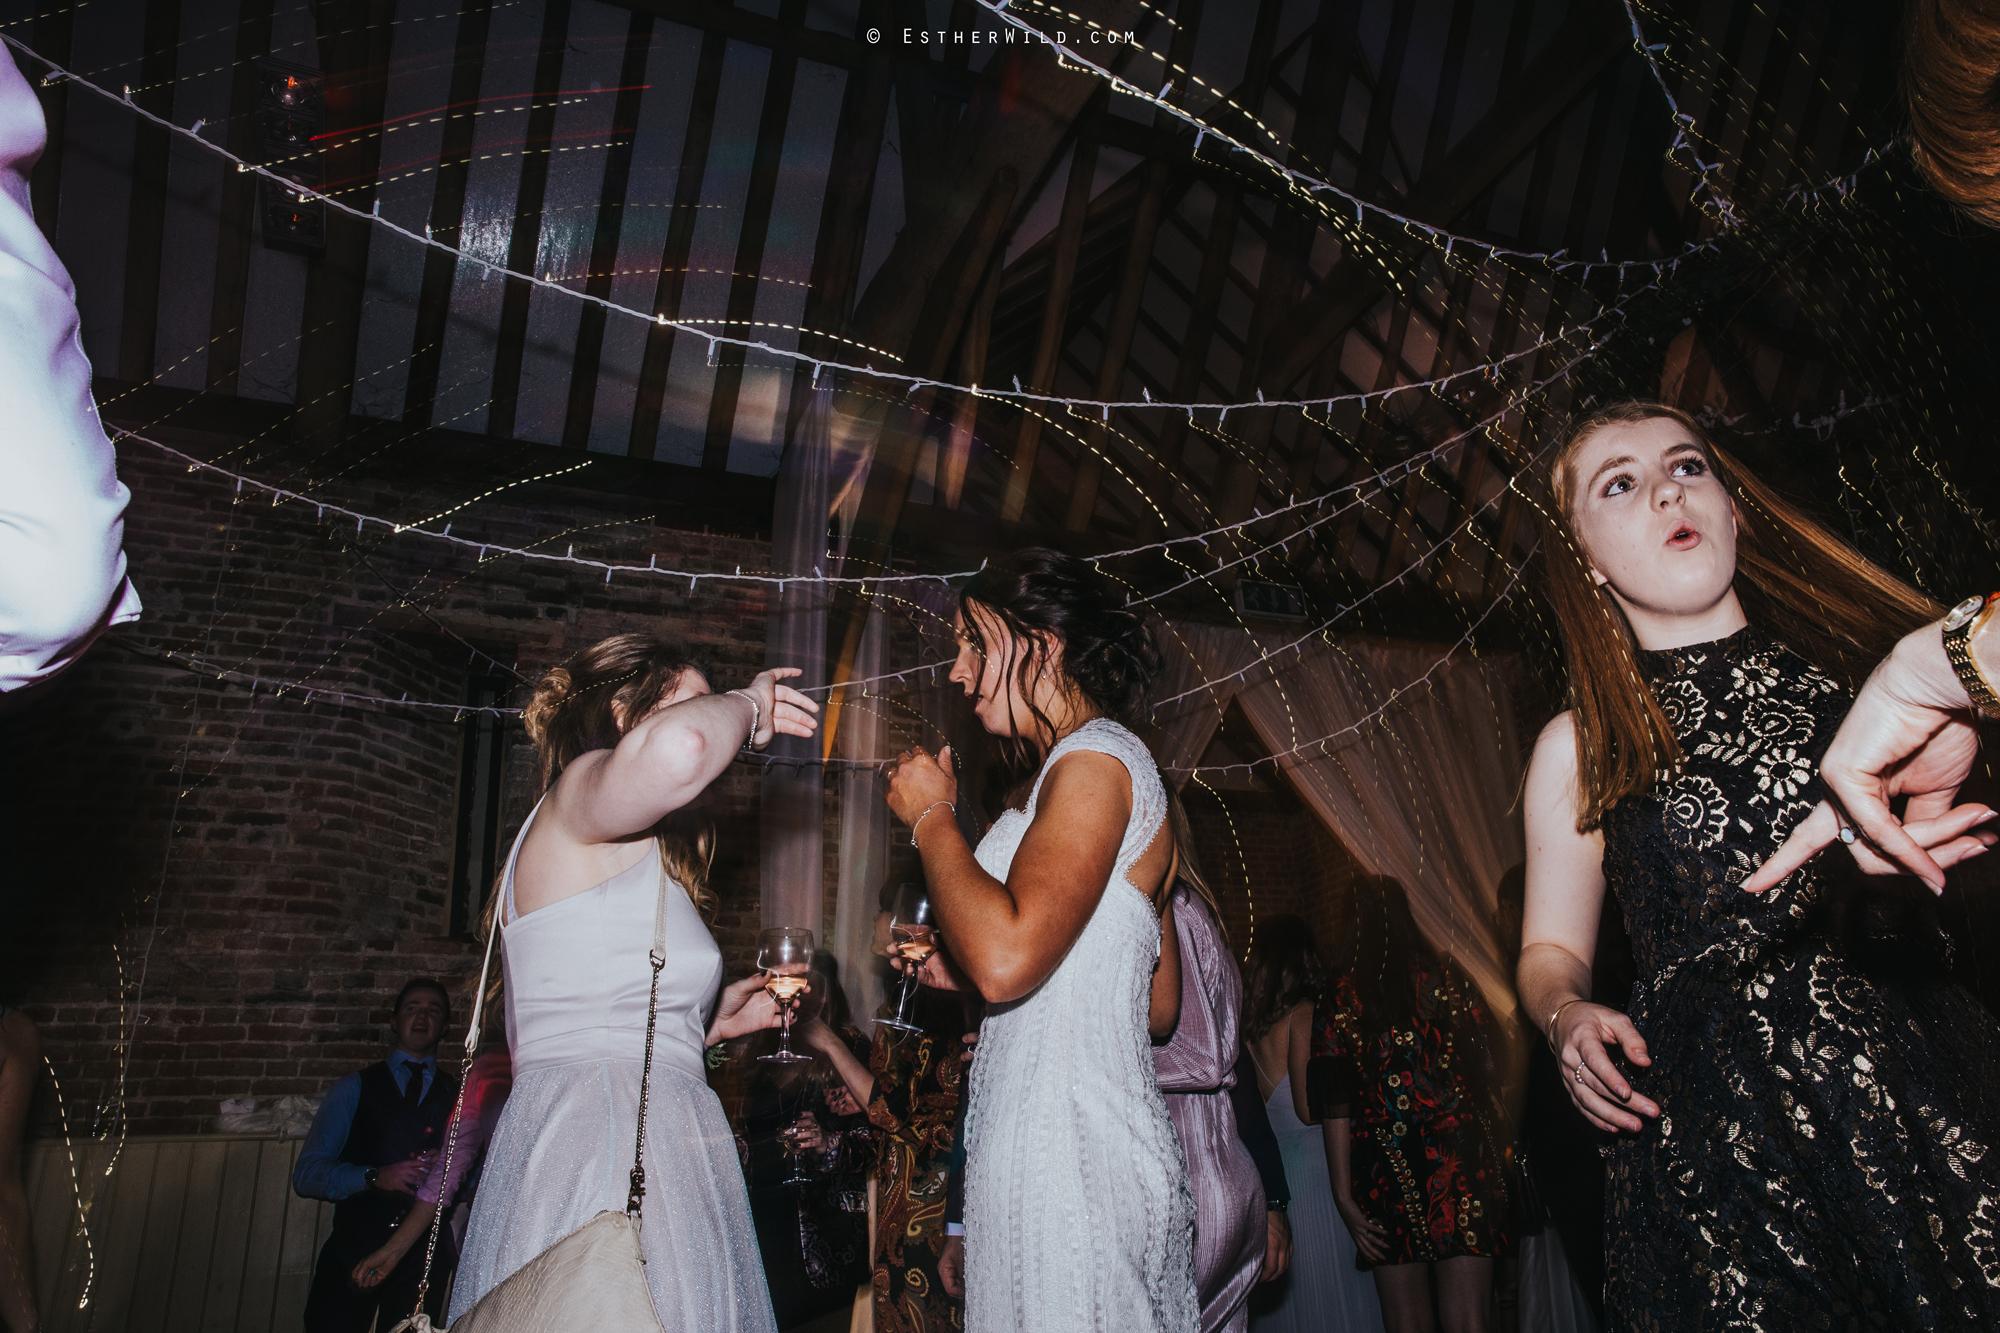 Elms_Barn_Weddings_Suffolk_Photographer_Copyright_Esther_Wild_IMG_3689.jpg